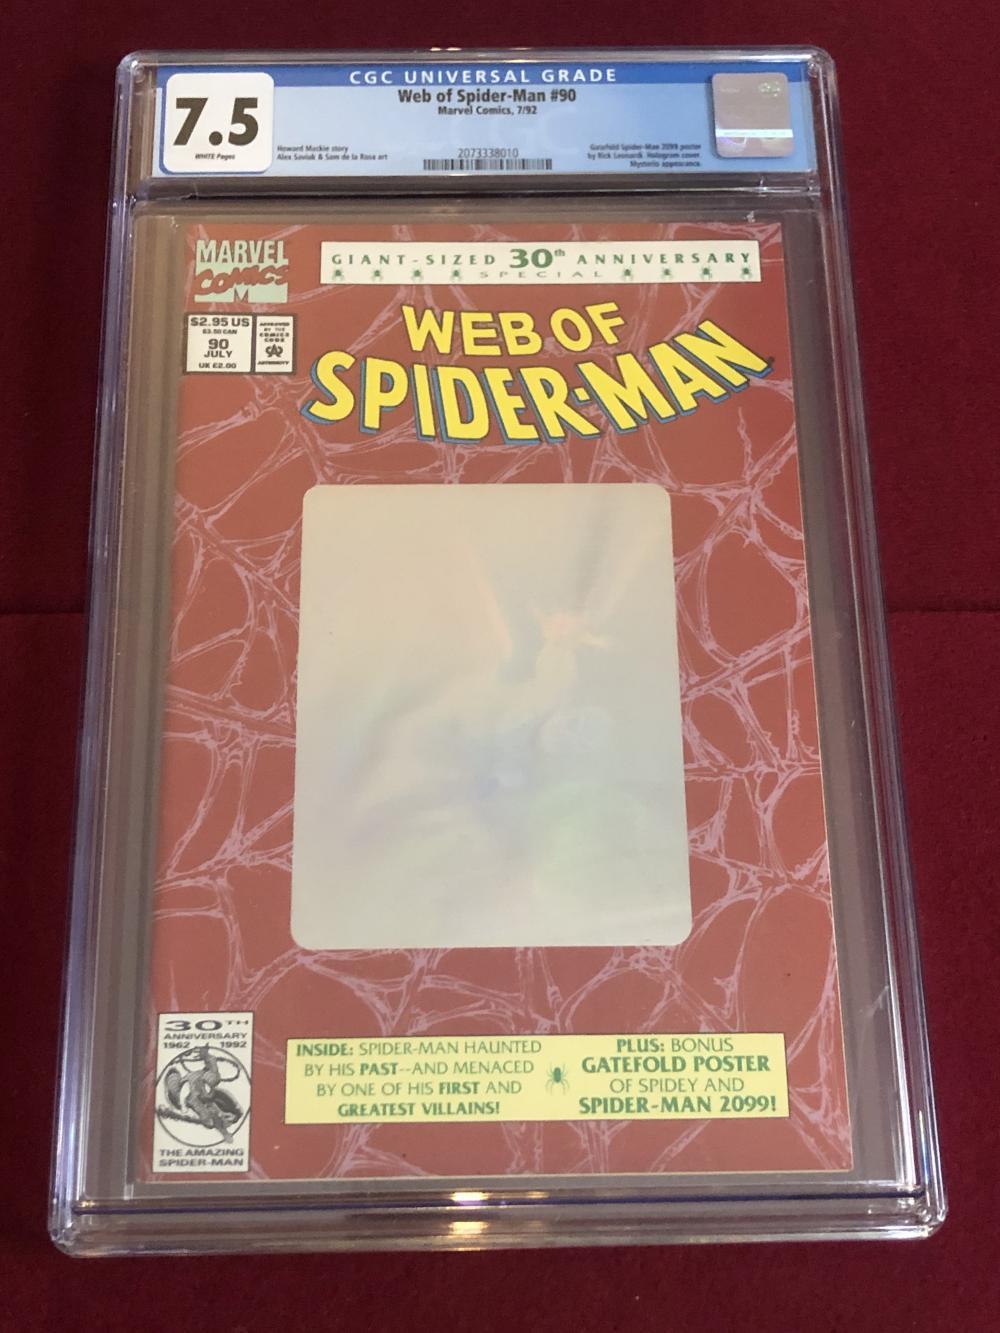 Web of Spider-man #90 Marvel comic - graded